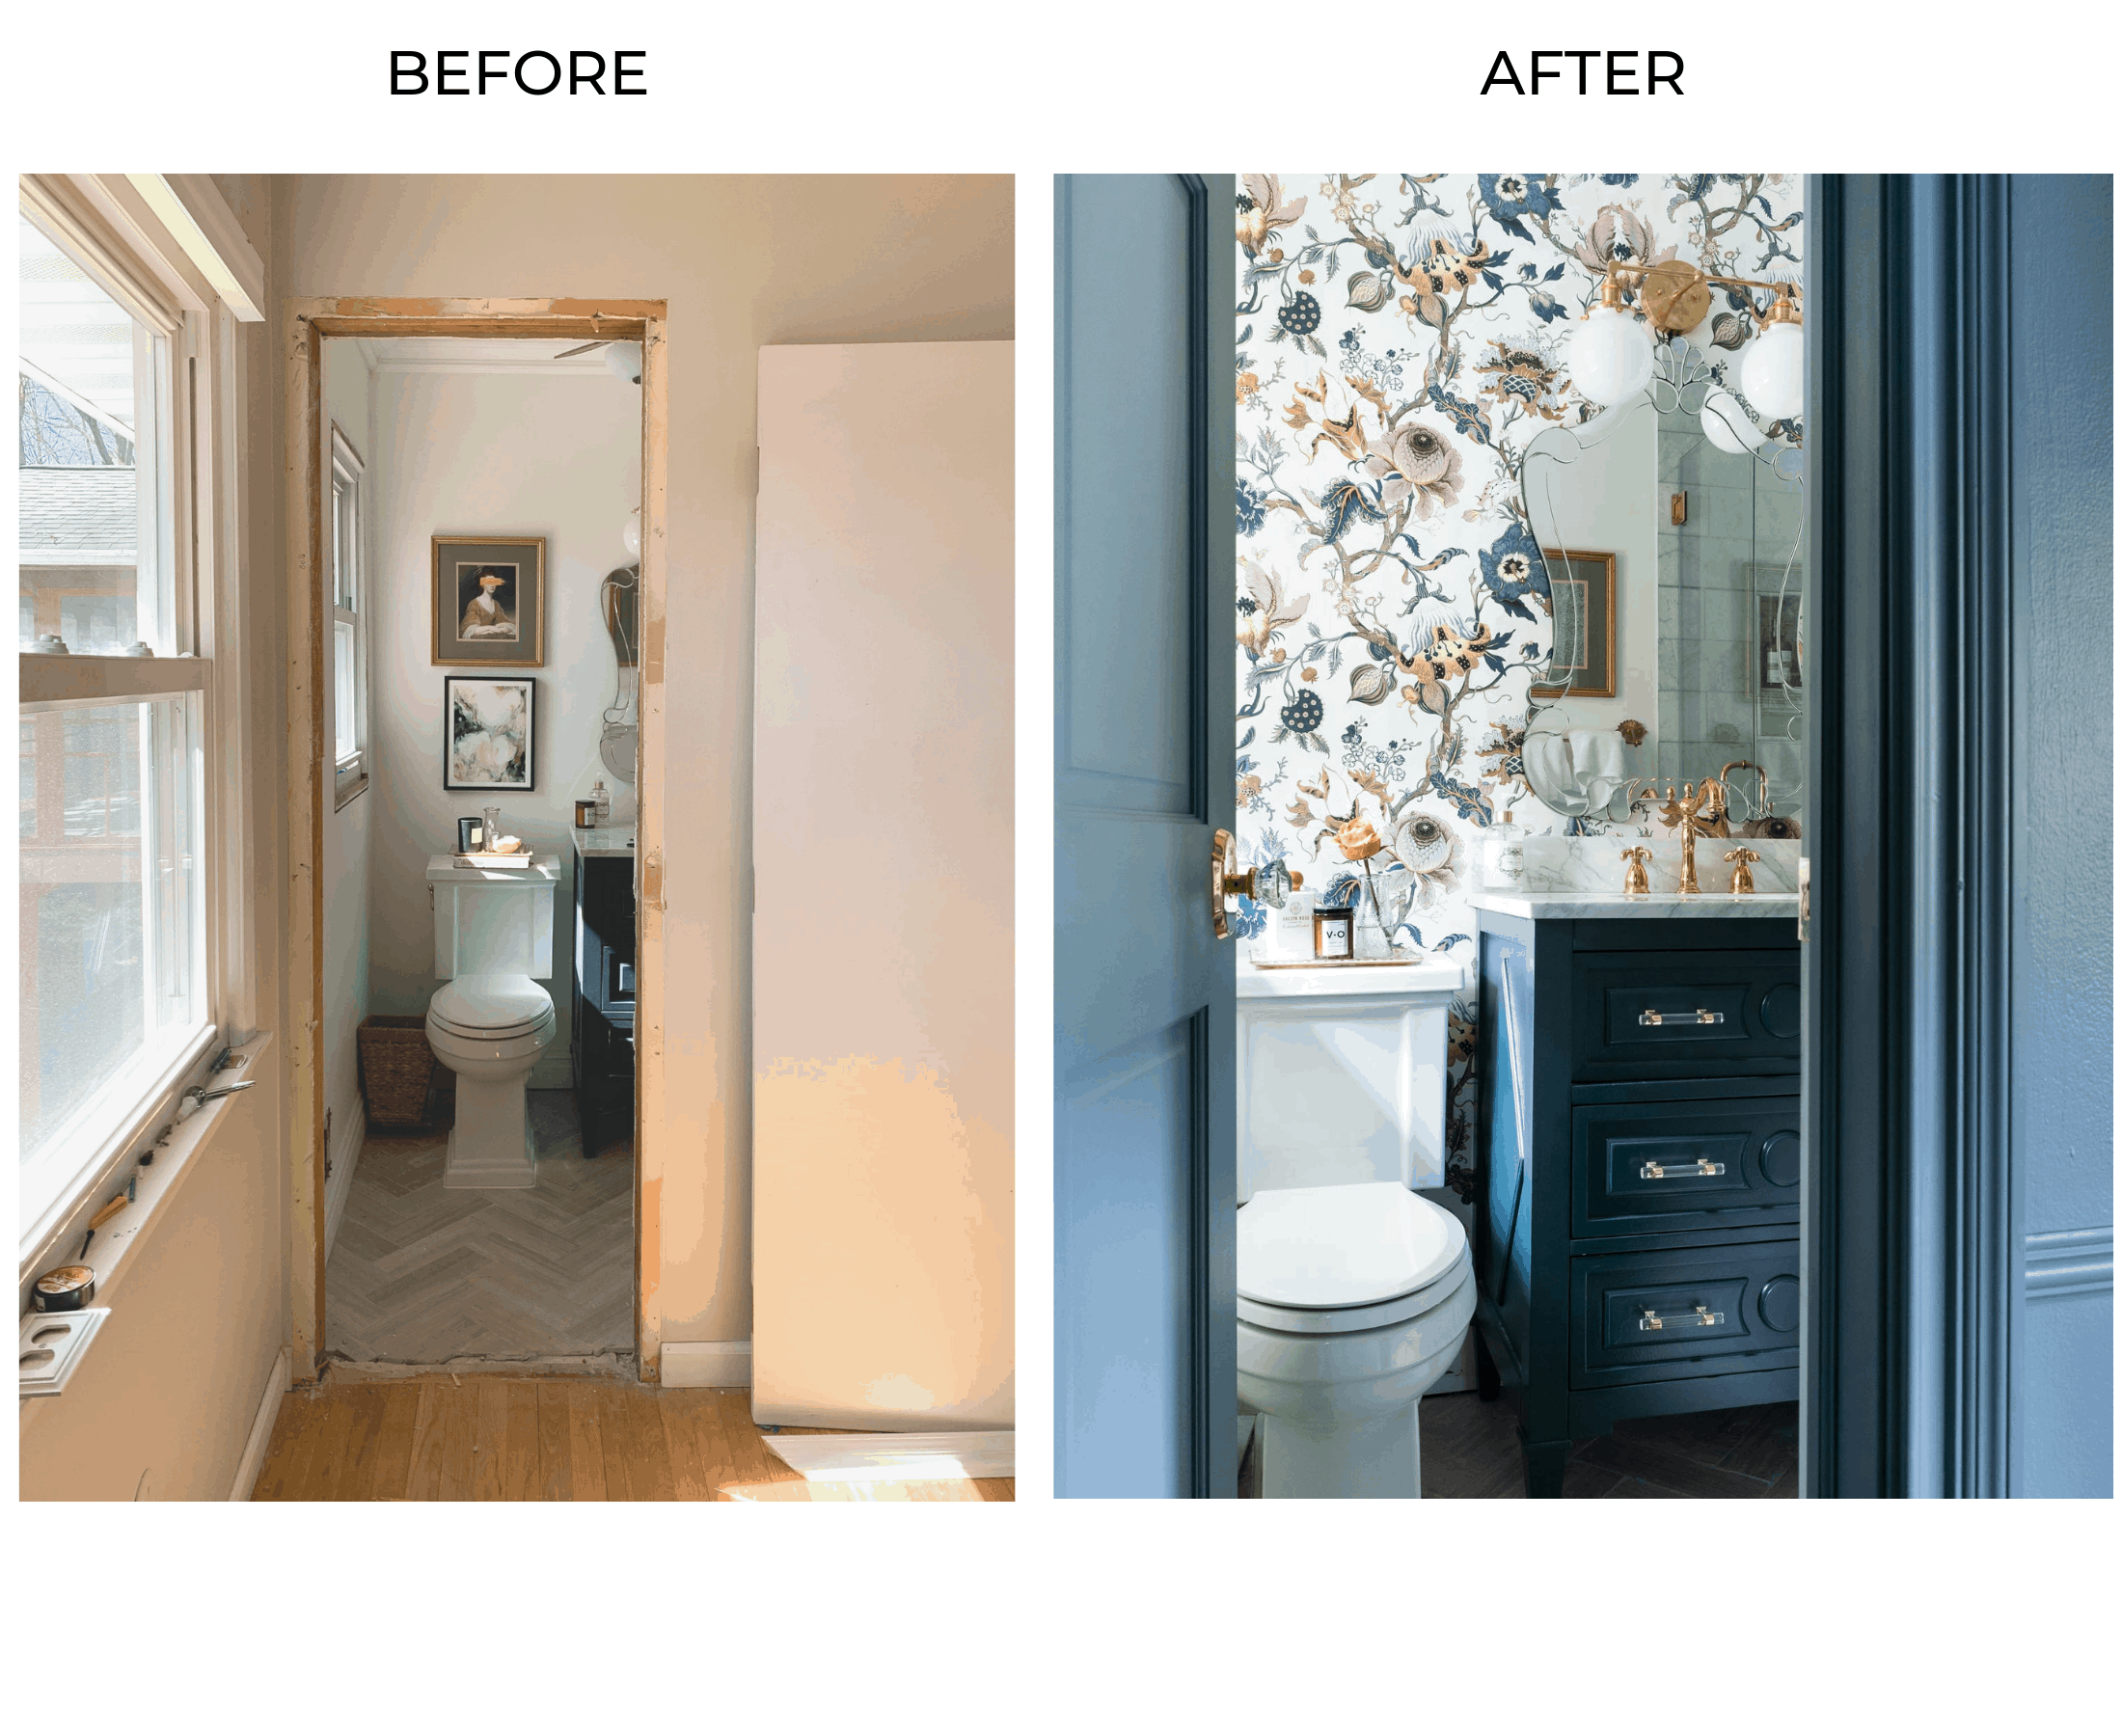 alisa-bovino-before-after